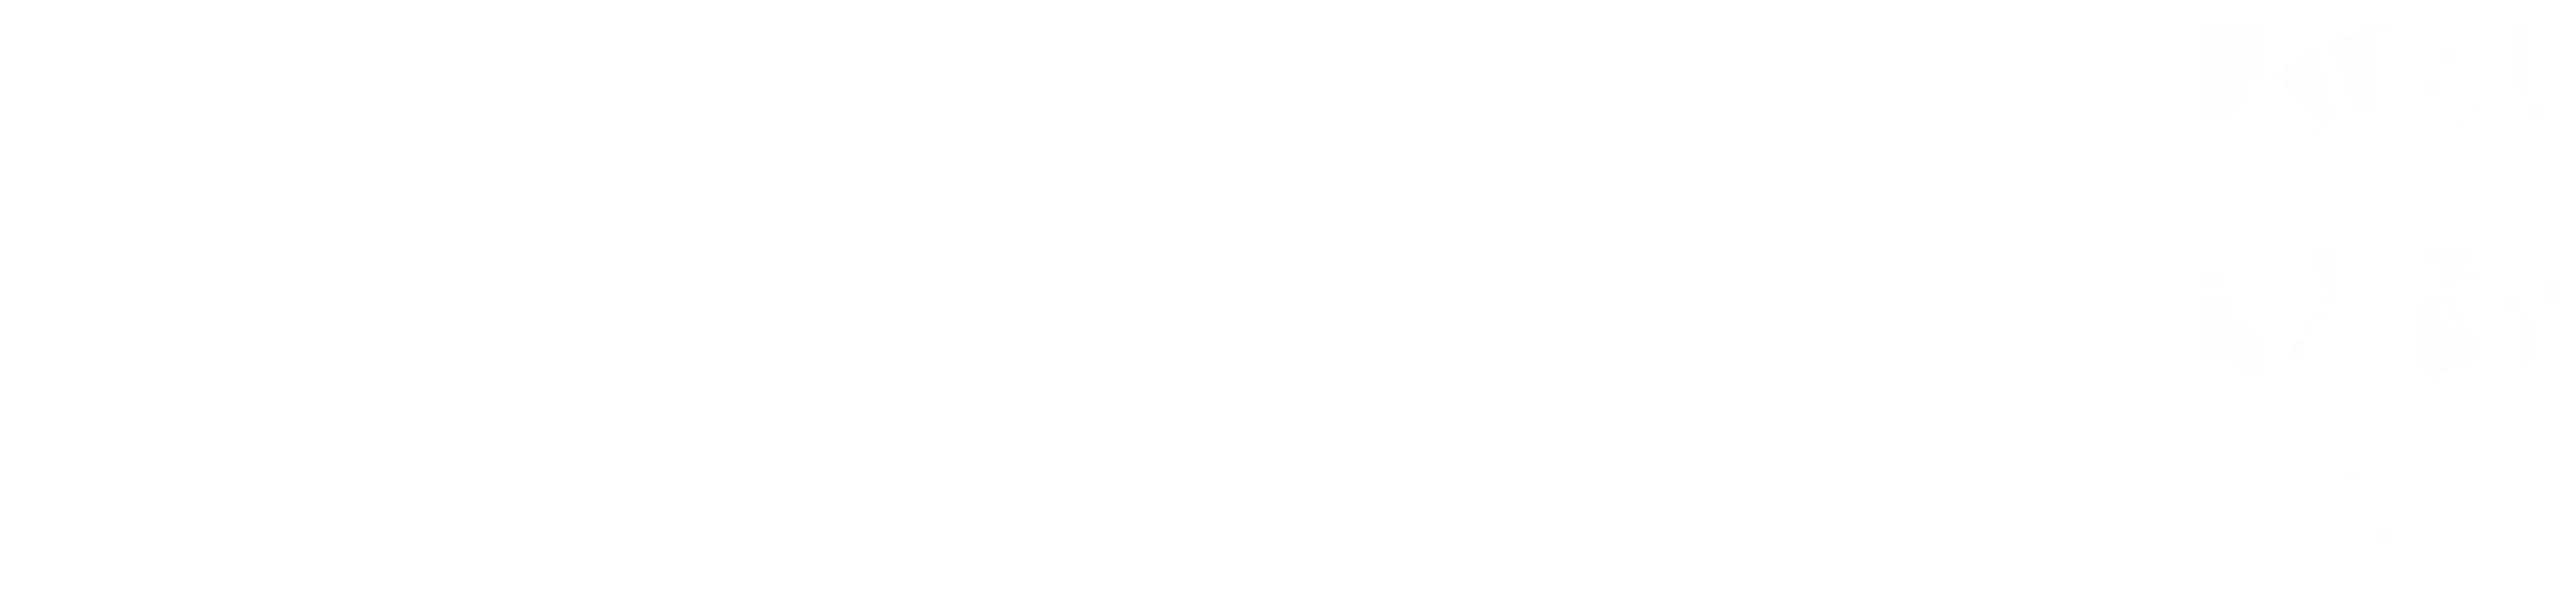 navarra gobierno Agenda2030